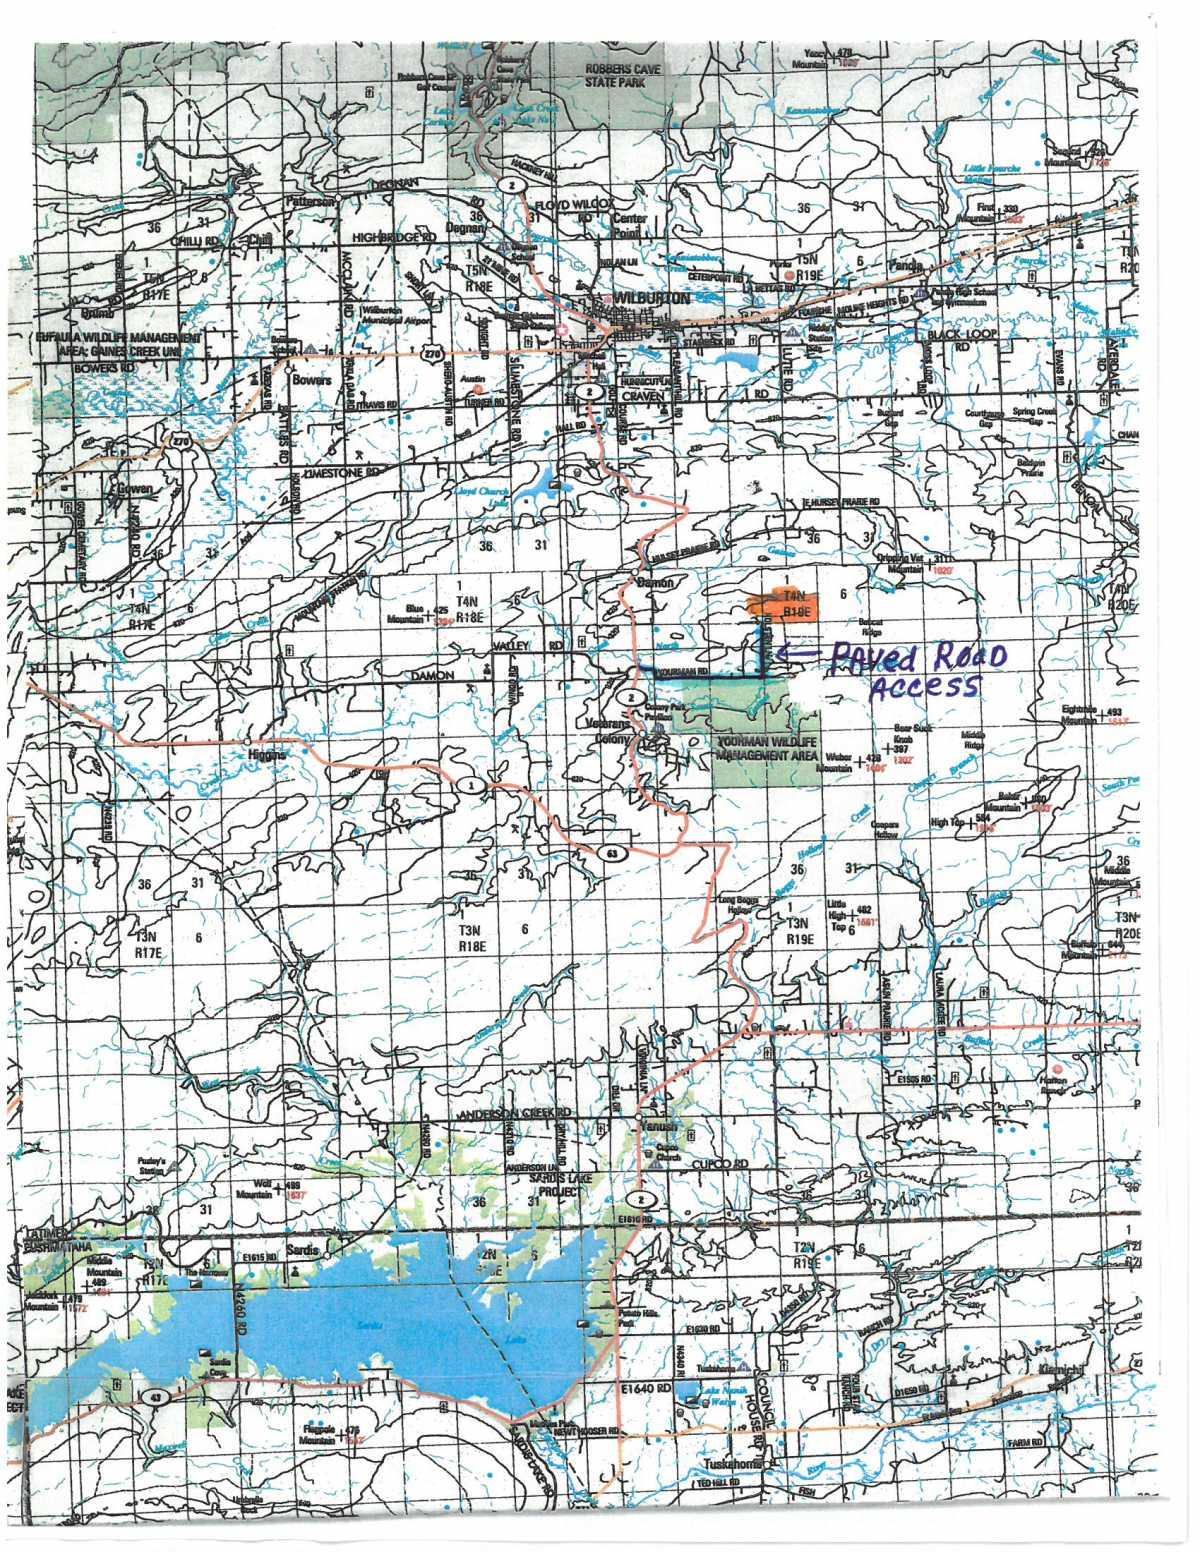 OKlahoma hunting land, Oklahoma Cabin, K hunting cabin ponds | Holsten Lane, 2022 Wilburton, OK 74578 1